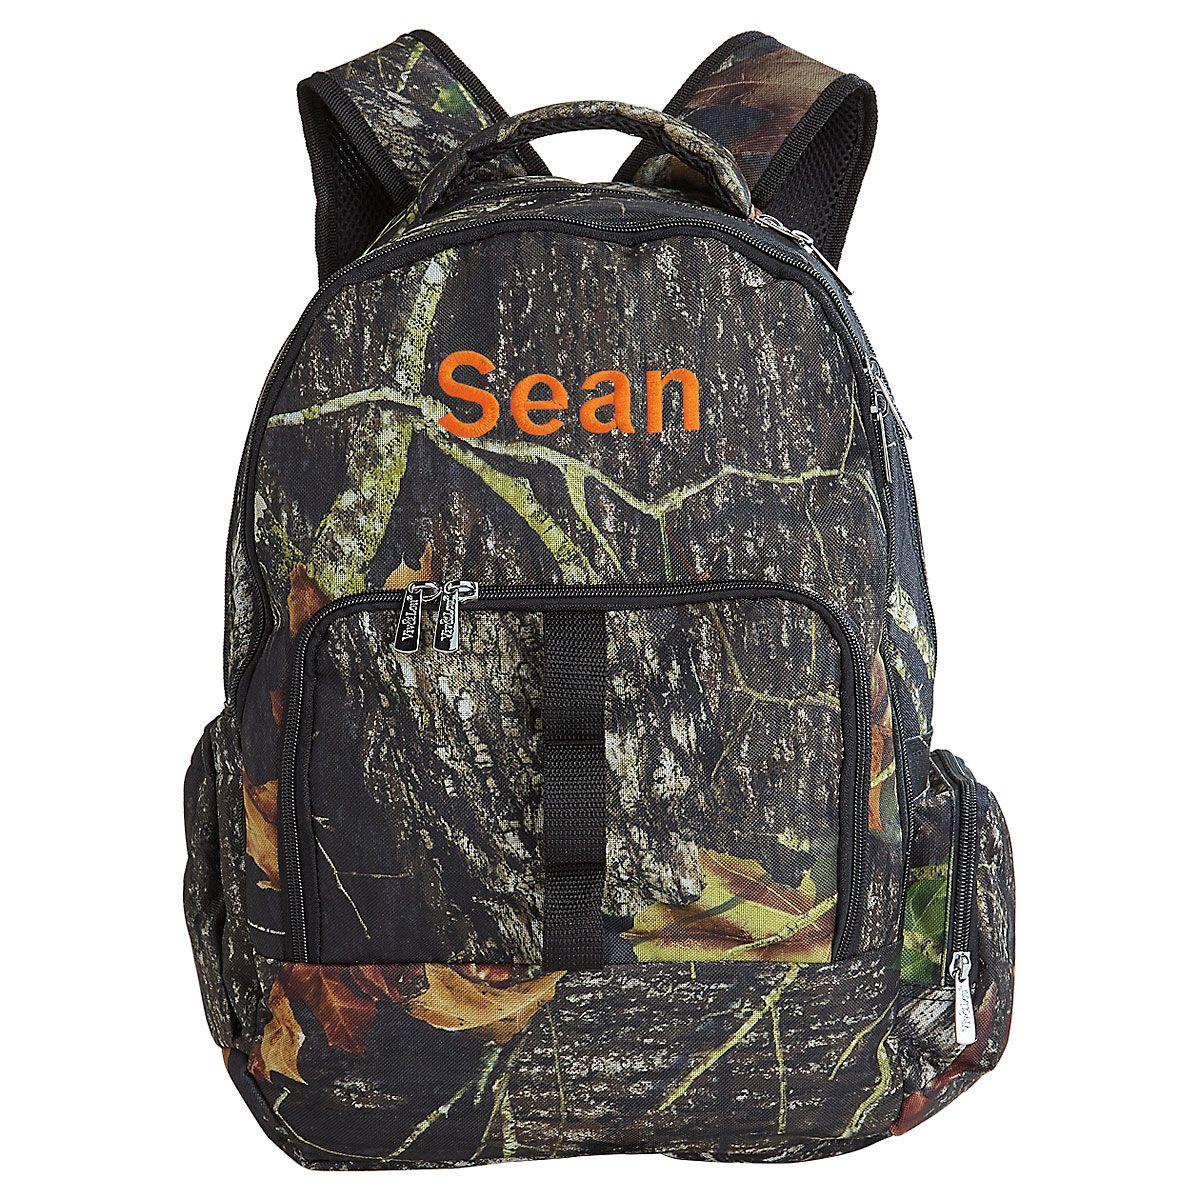 Woods Backpack - Name